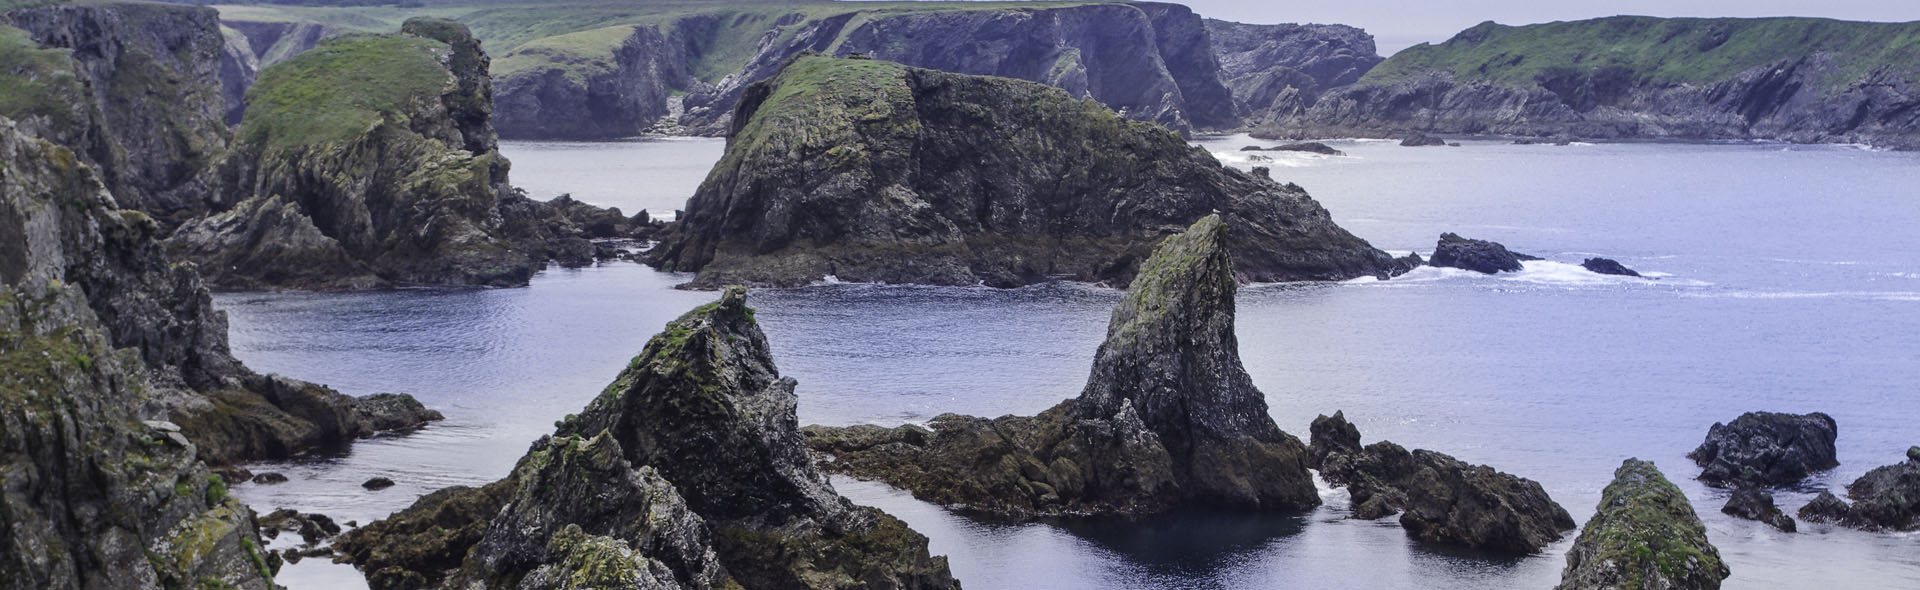 Die Belle-Ile aus dem Blickwinkel Claude Monets